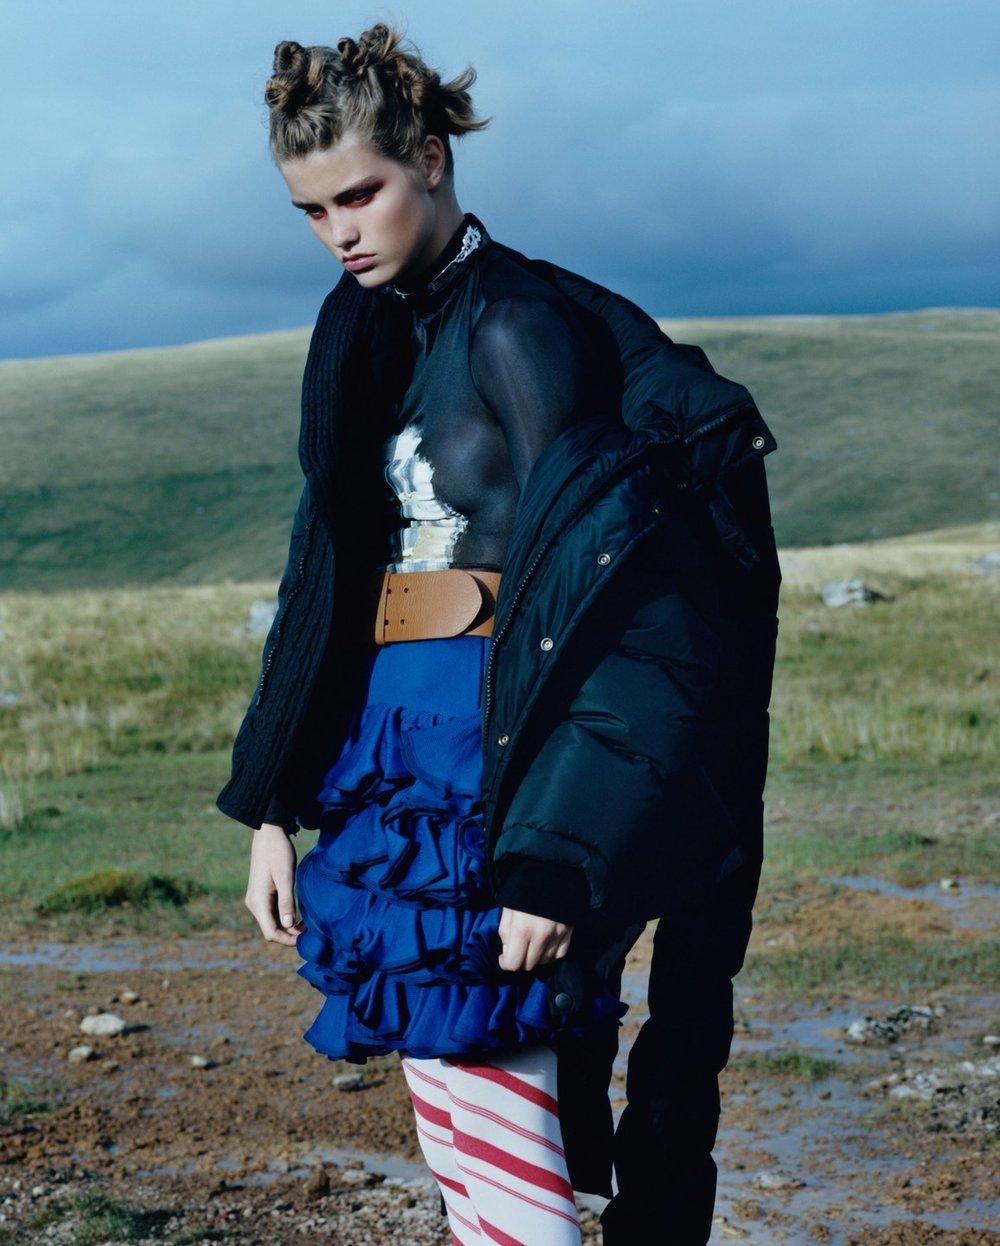 Le M du Mode Spet 24th 2016 - luna-bijl-oliver-hadlee-pearch- (13).jpg